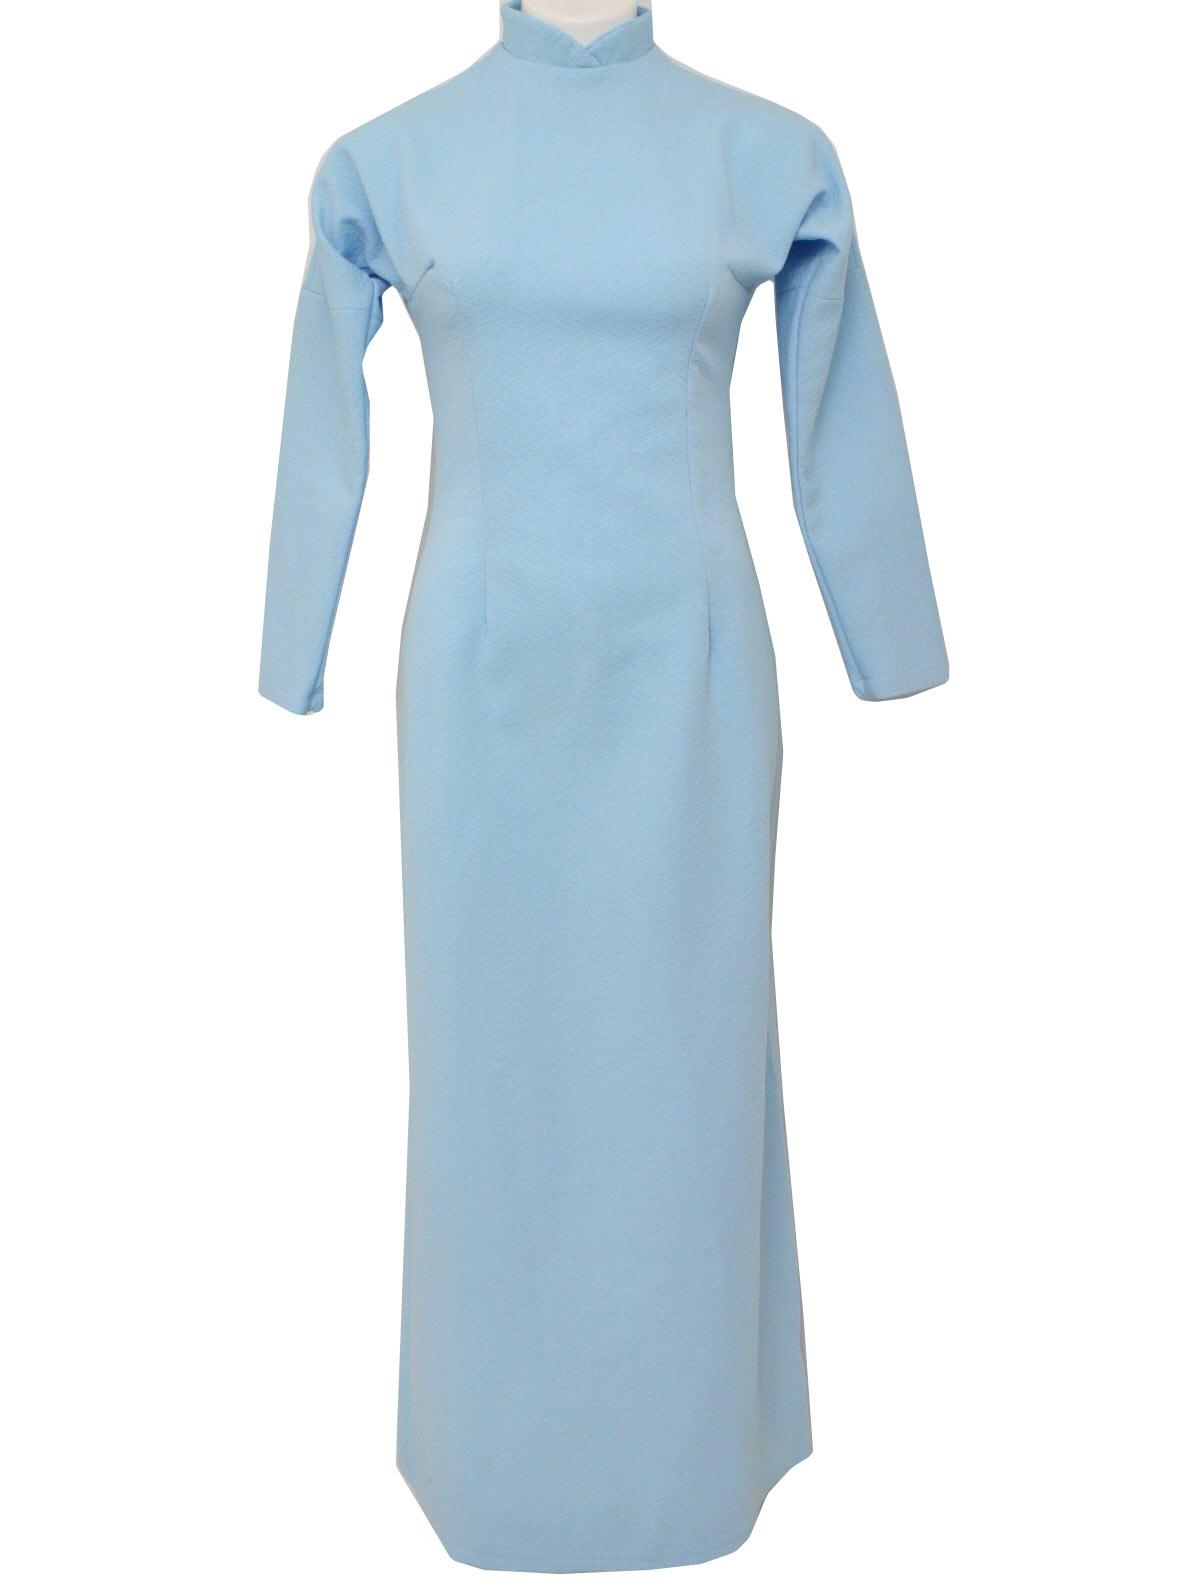 Retro 70\'s Dress: 70s -Home Sewn- Womens light blue tweed-textured ...